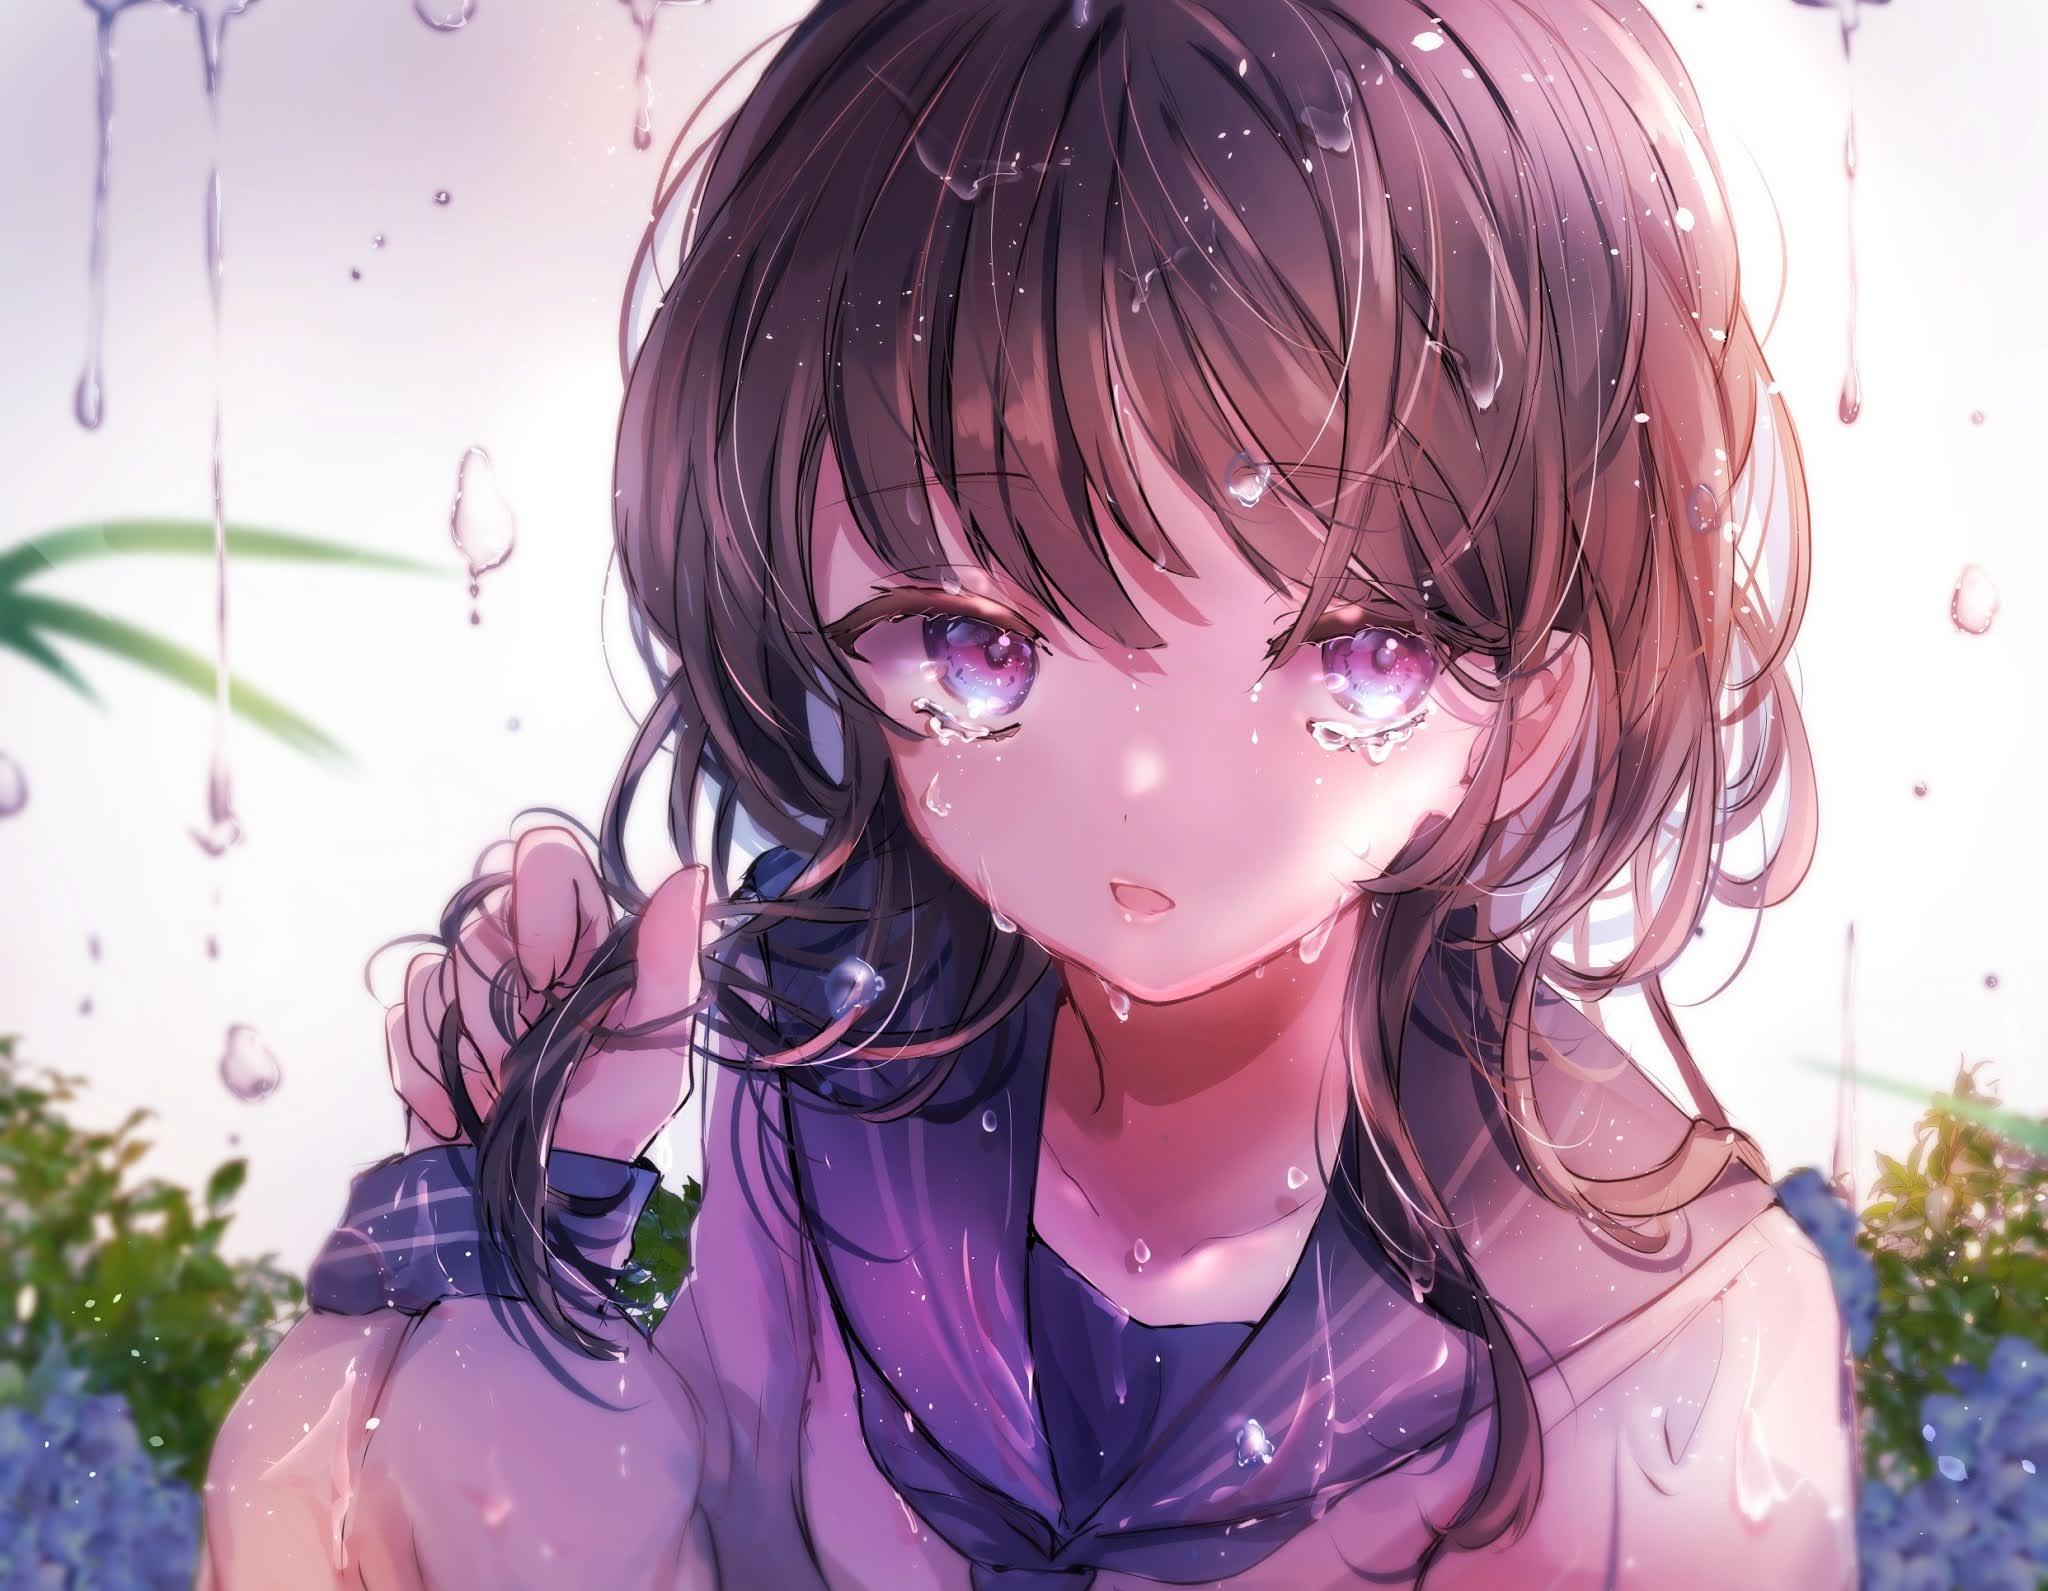 sad depressed anime girl